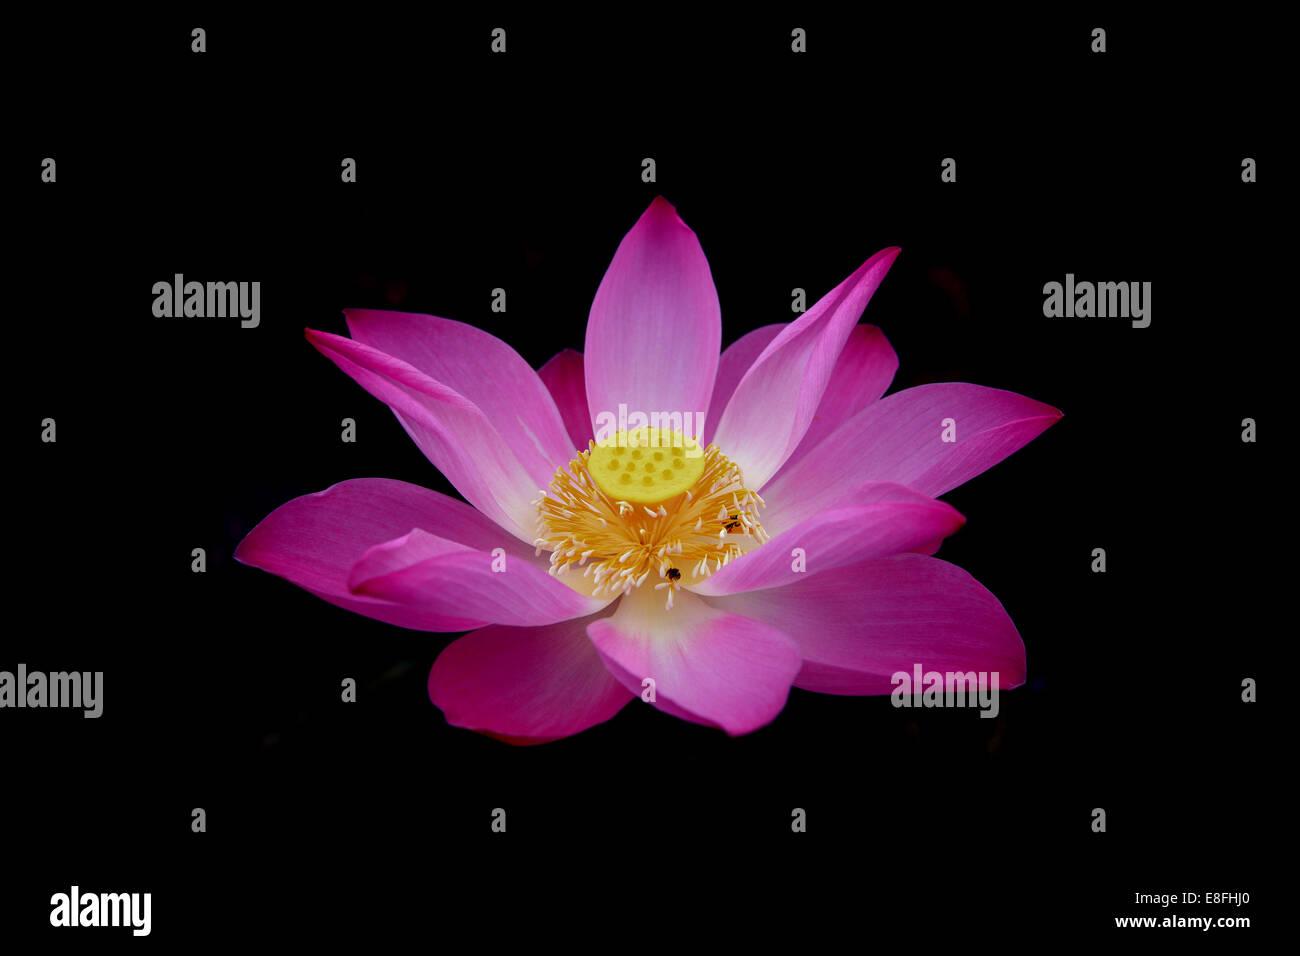 Lotus flower stock photos lotus flower stock images alamy close up of pink lotus flower nelumbo nucifera stock image izmirmasajfo